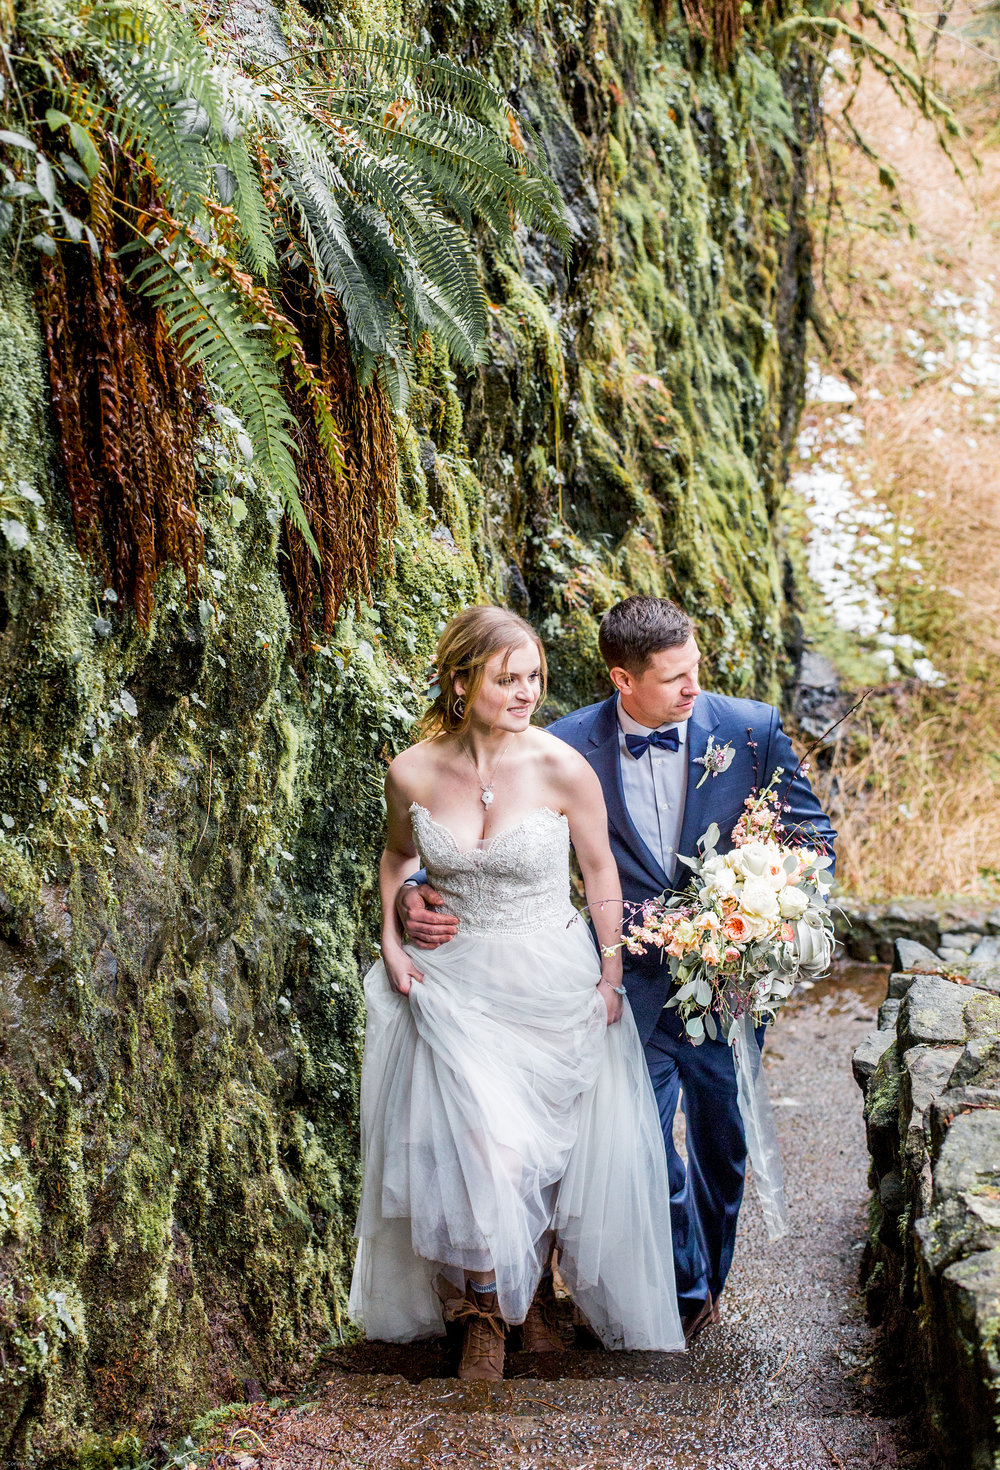 Silver Falls-elopement-bride-and-groom-photo Corina Silva Studios-198.jpg